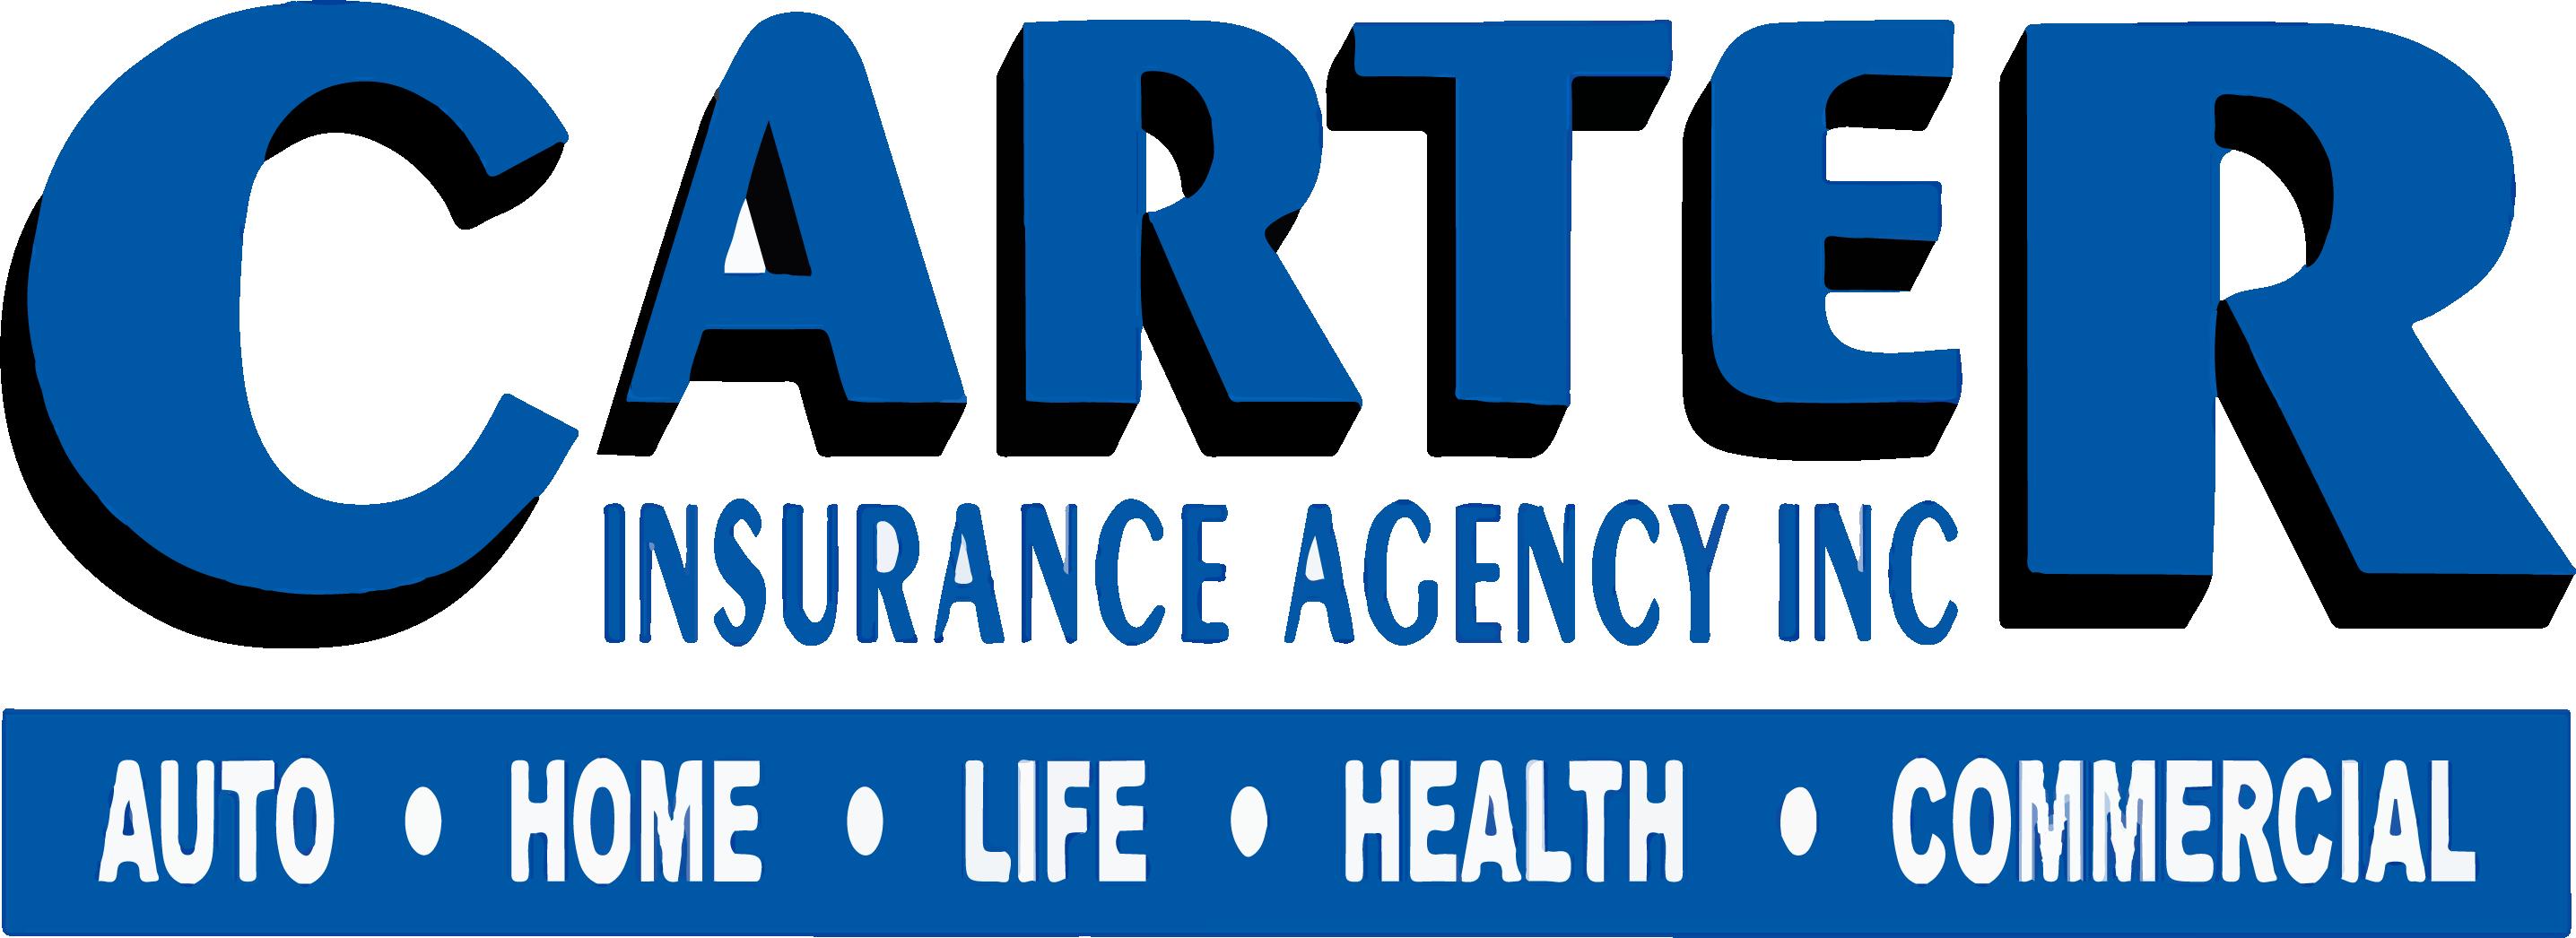 Carter Insurance Agency